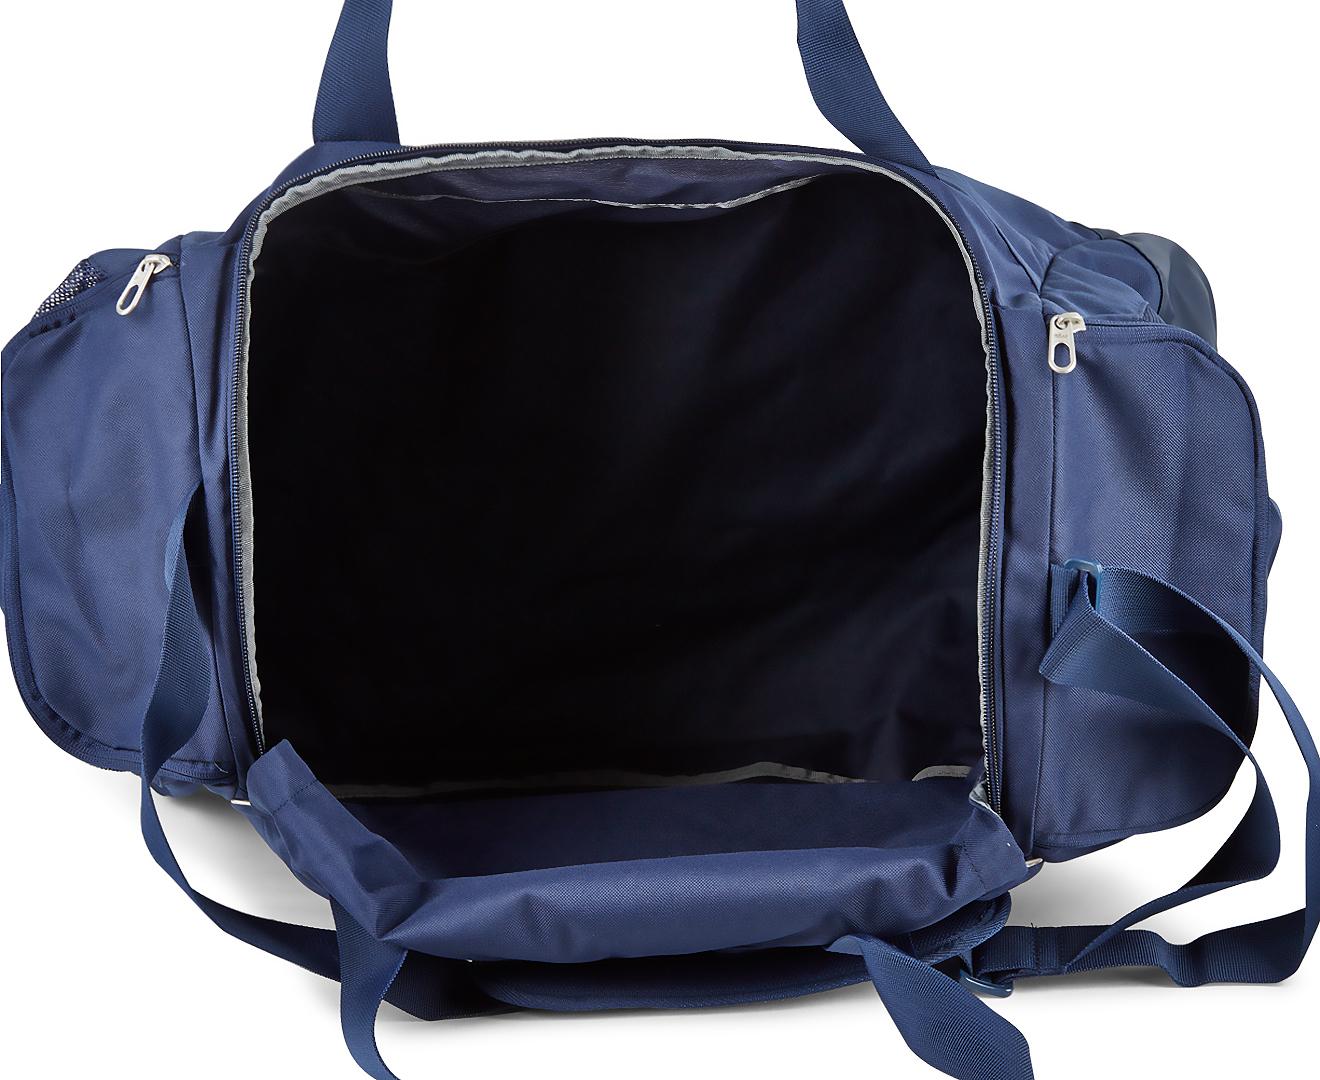 852047dcbdfb51 Nike Club Team Swoosh Large Duffel Bag - Navy | Catch.com.au